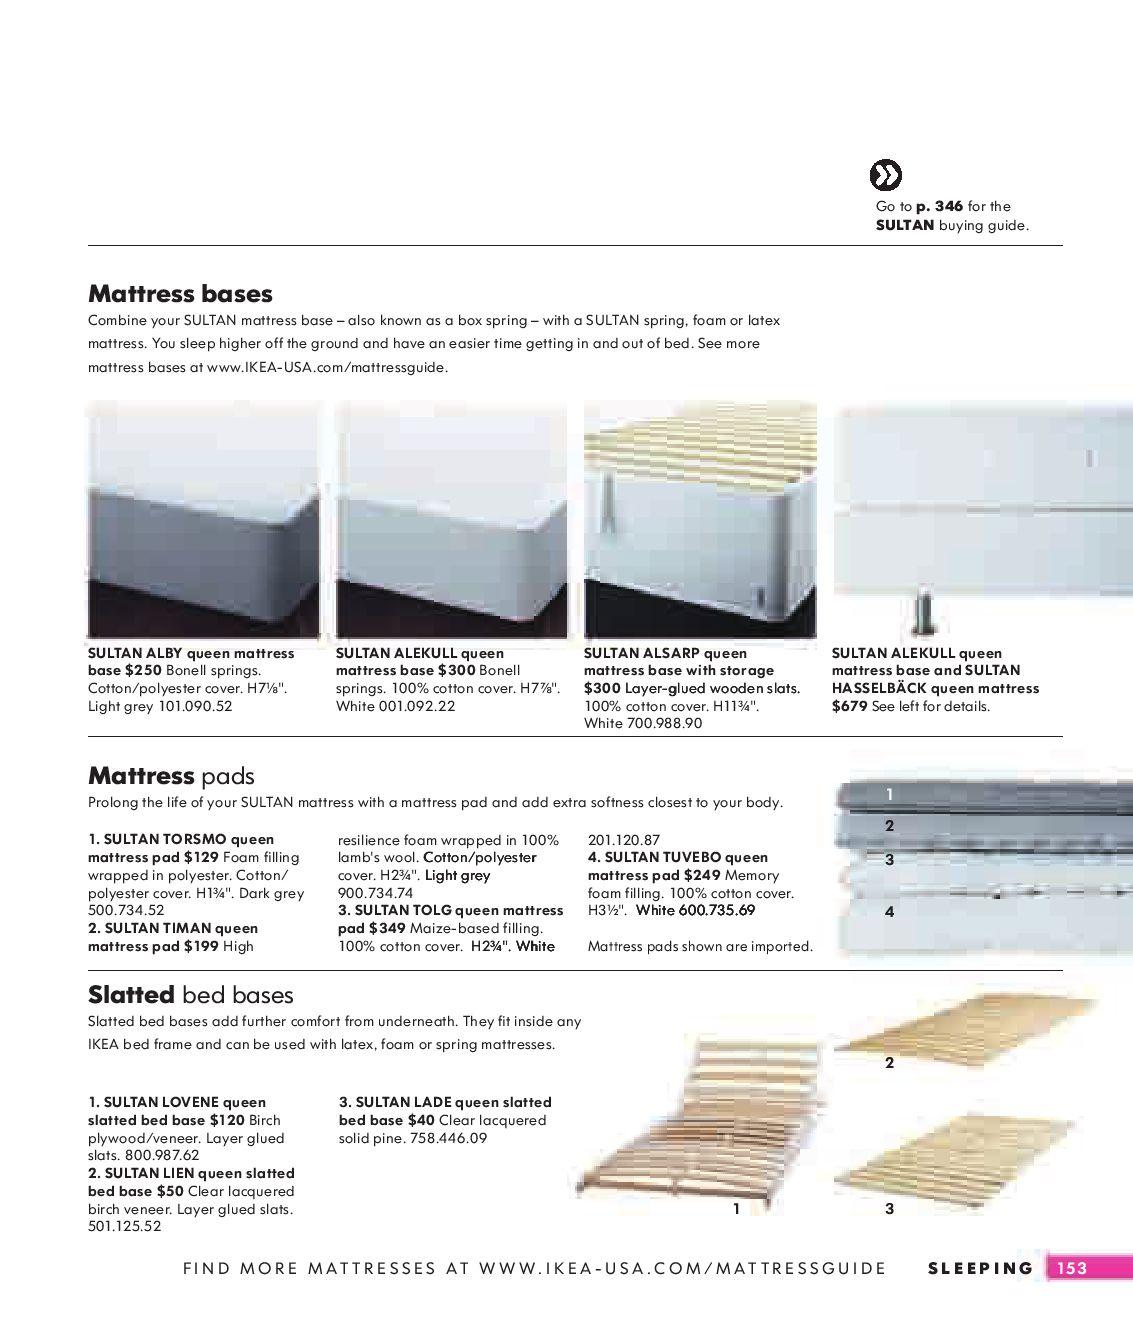 ikea 2008 catalog by odabashianr issuu. Black Bedroom Furniture Sets. Home Design Ideas